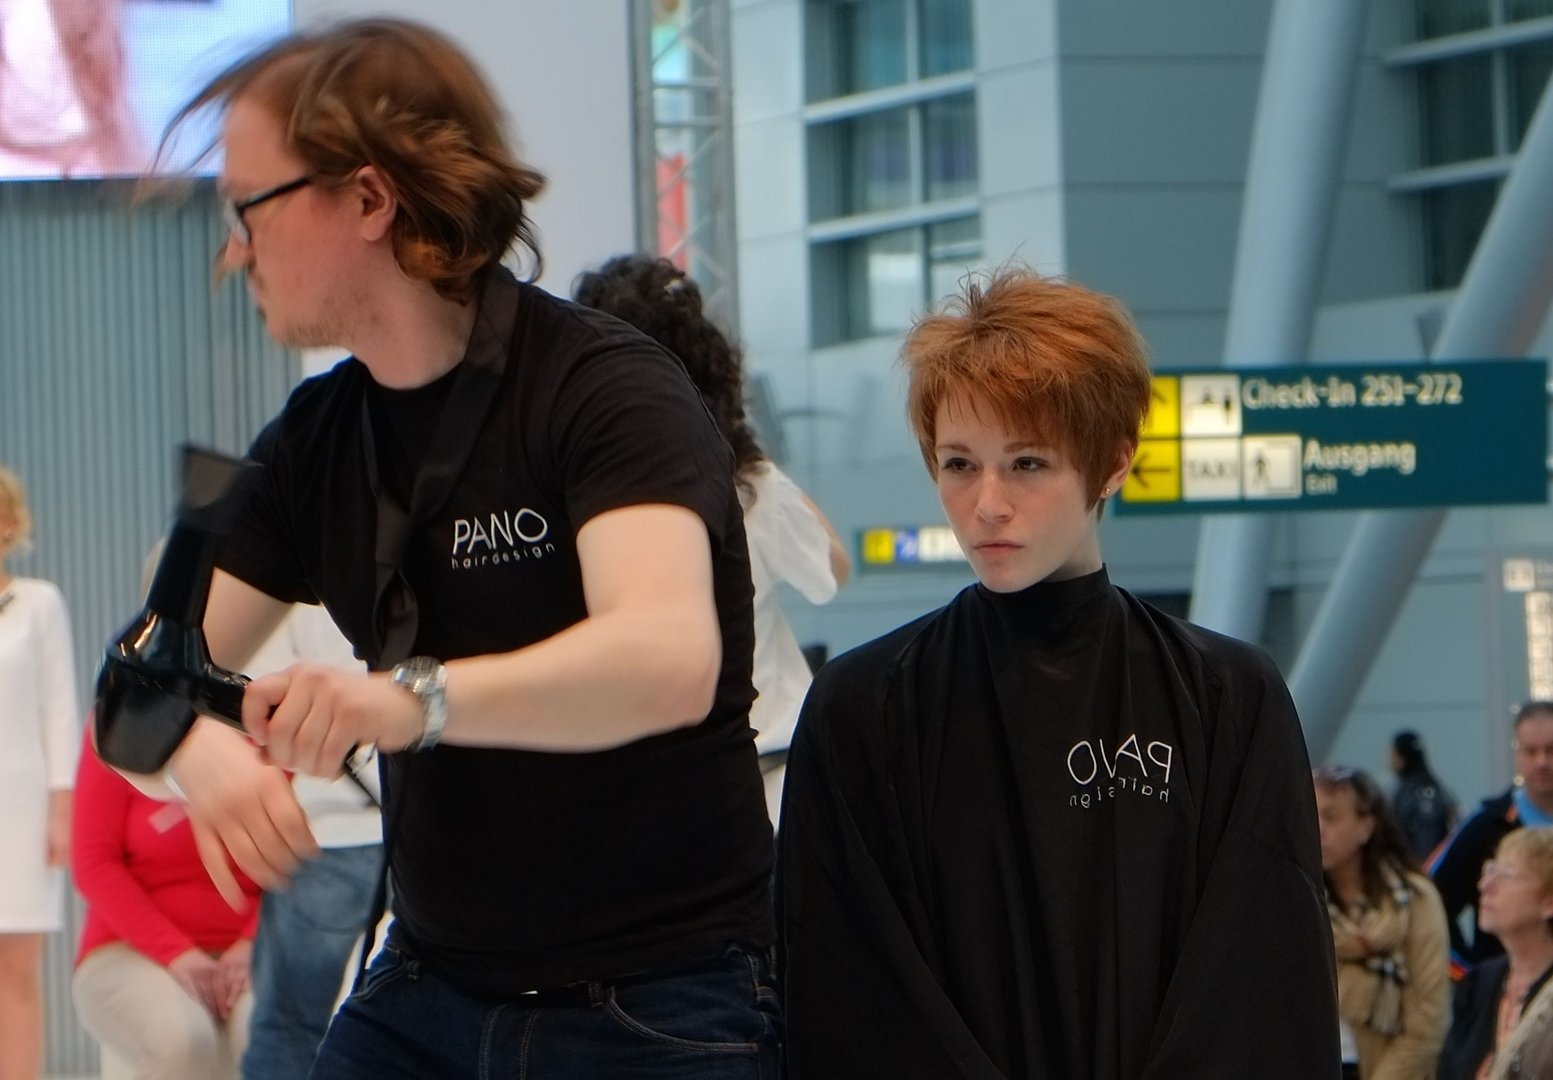 Frisur auf Tour am Airport Düsseldorf